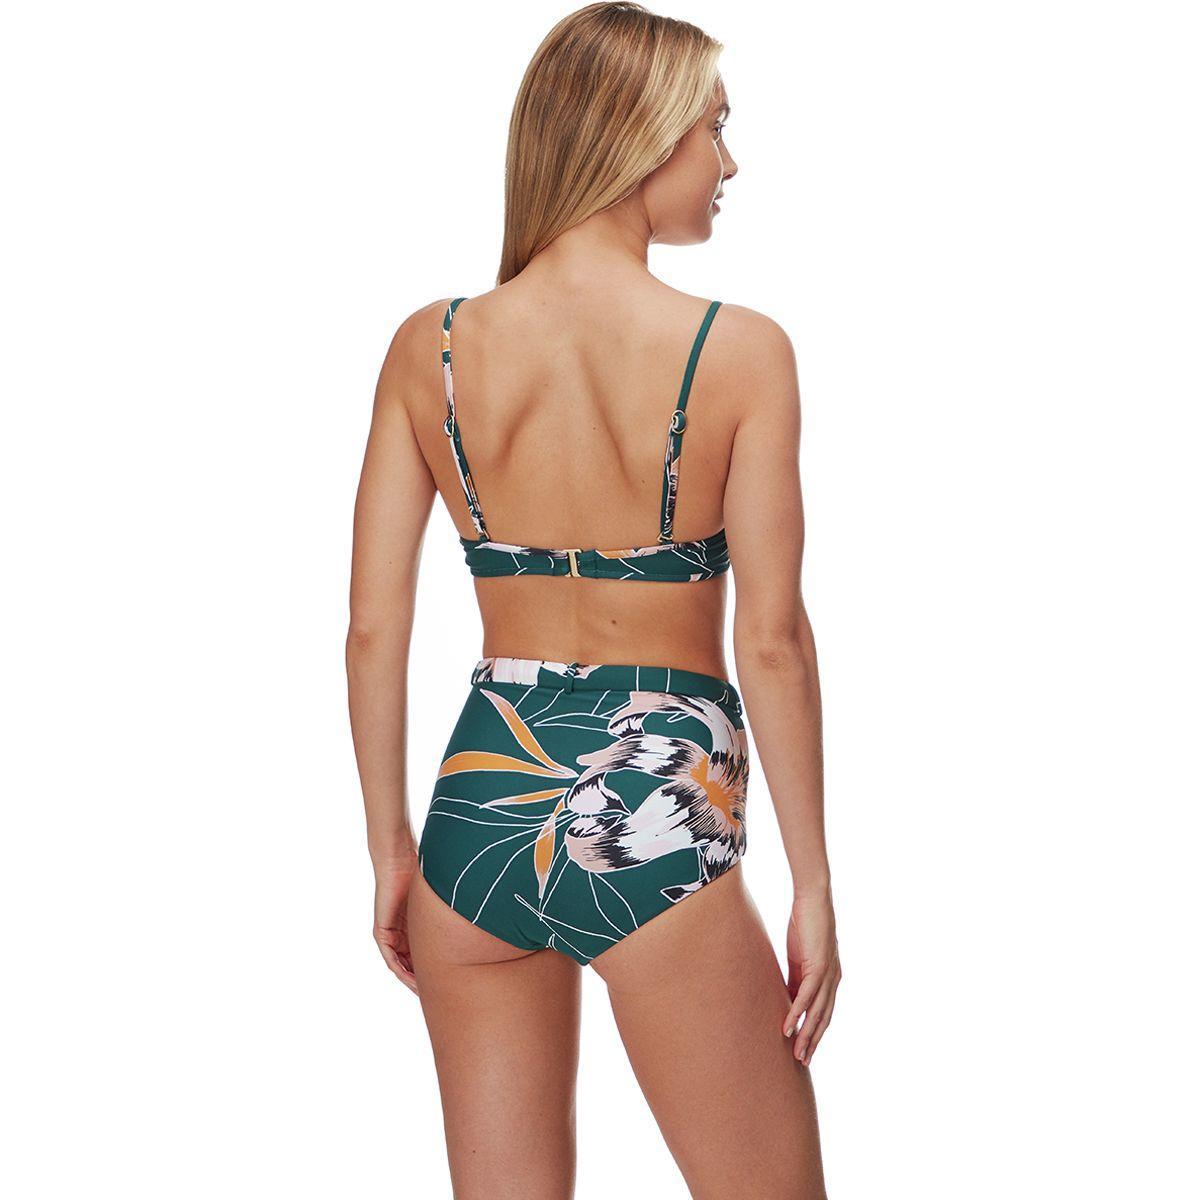 06452d5aa677a Seafolly - Green Aralia Belted Hi-waist Bikini Bottom - Lyst. View  fullscreen